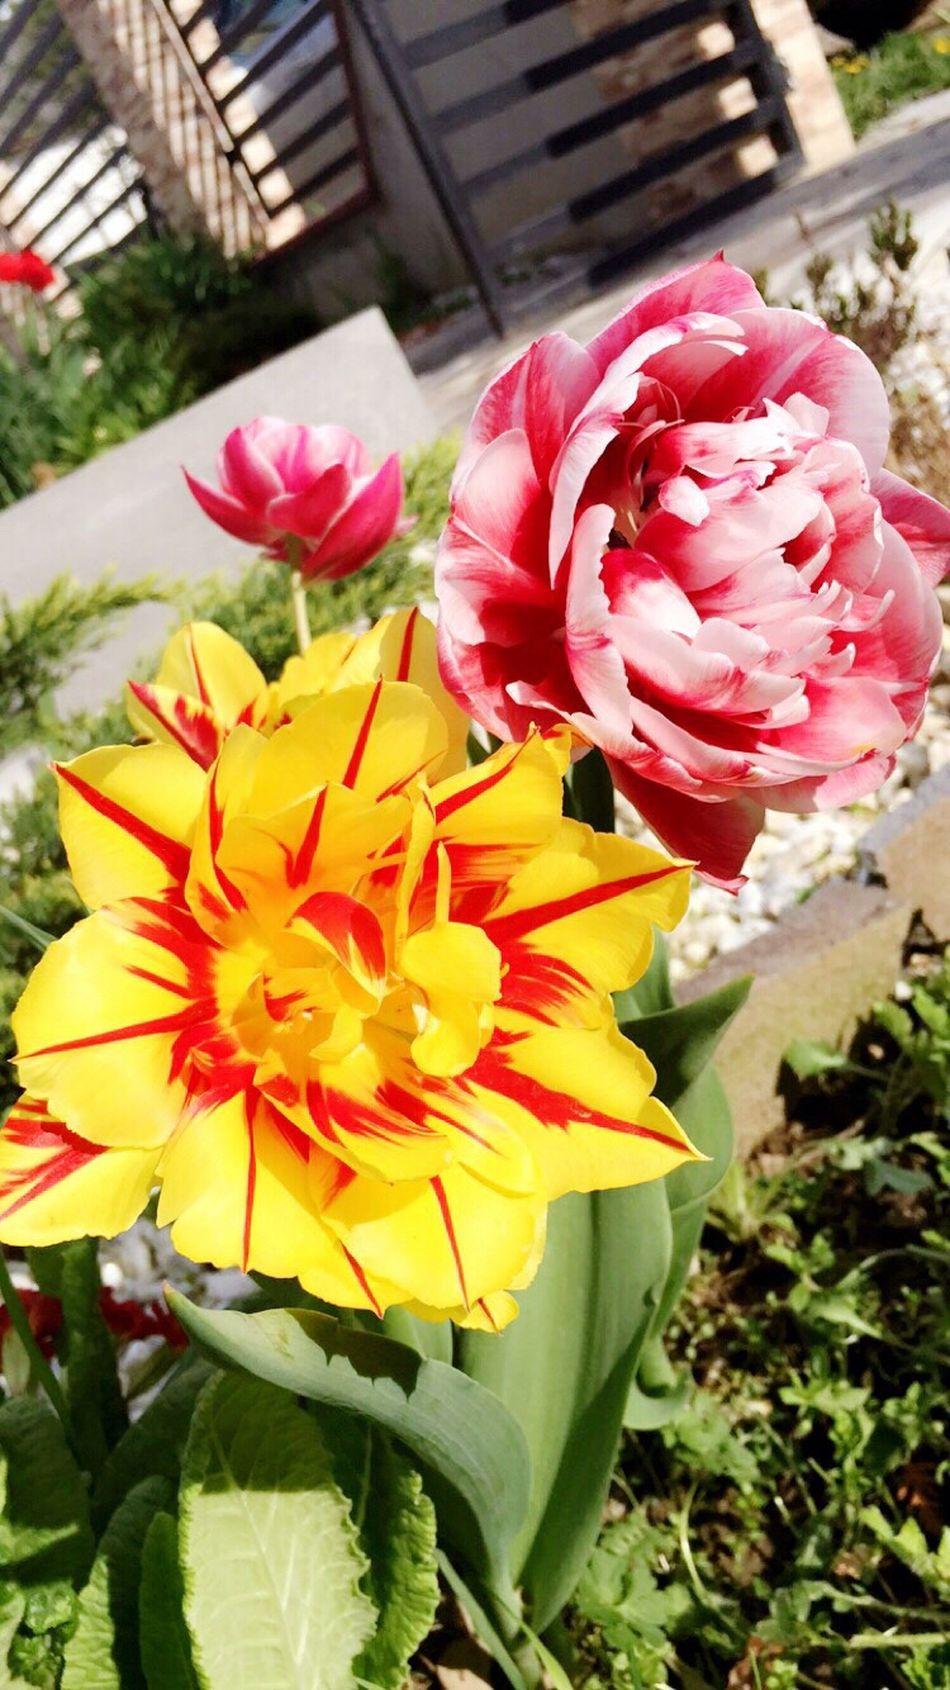 Adinafrasinphotography Spring Spring Flowers Flowers OpenEdit Outdoors Photography Colors Colorful Beautiful Beautiful Nature 🌷💐💞 First Eyeem Photo